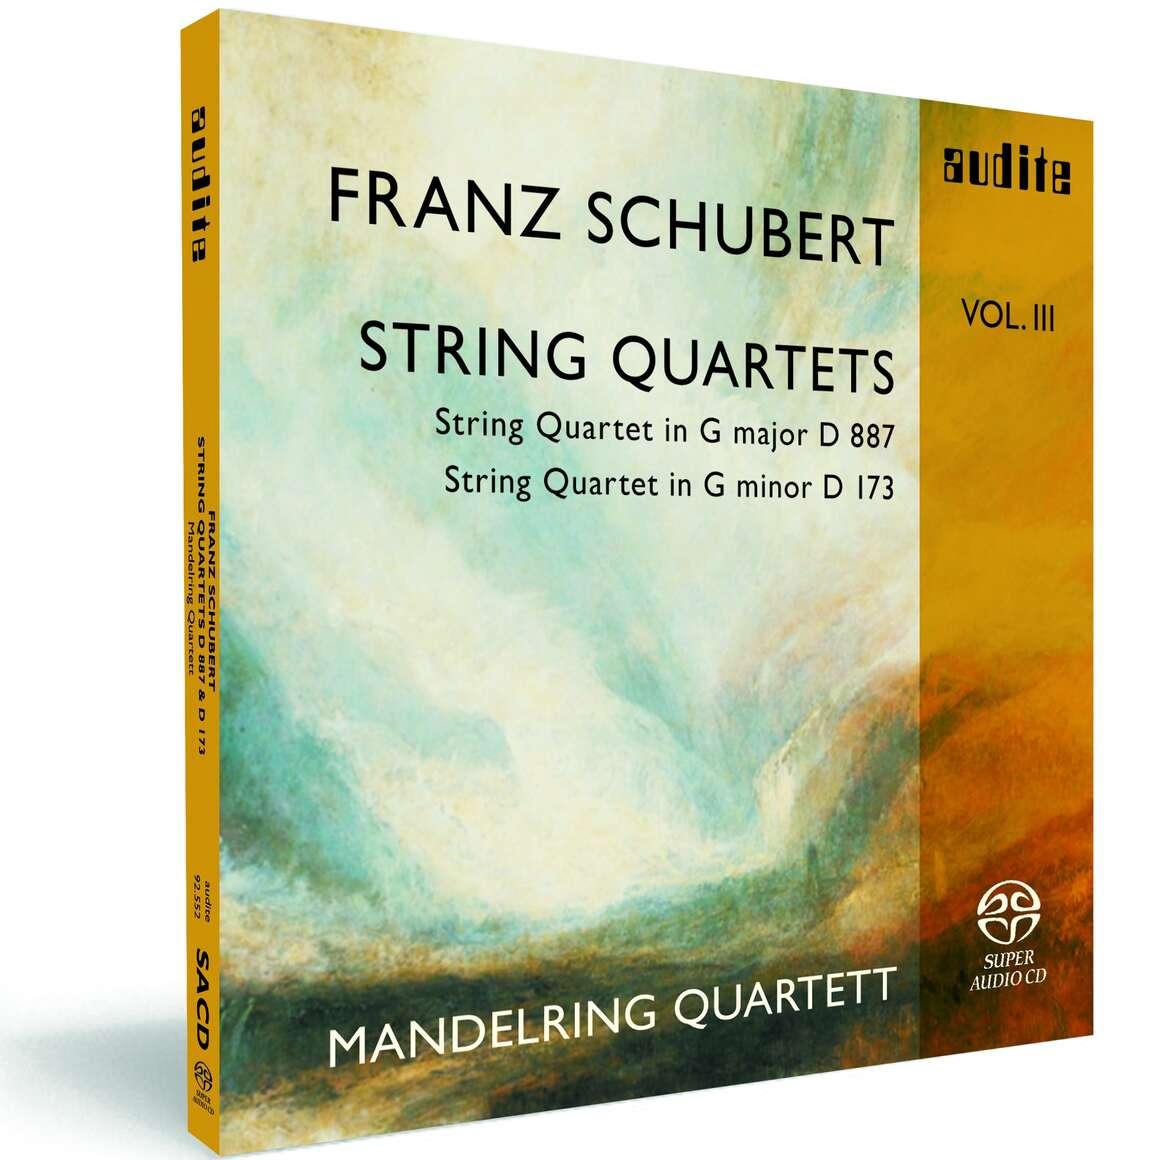 F. Schubert: String Quartets Vol. III